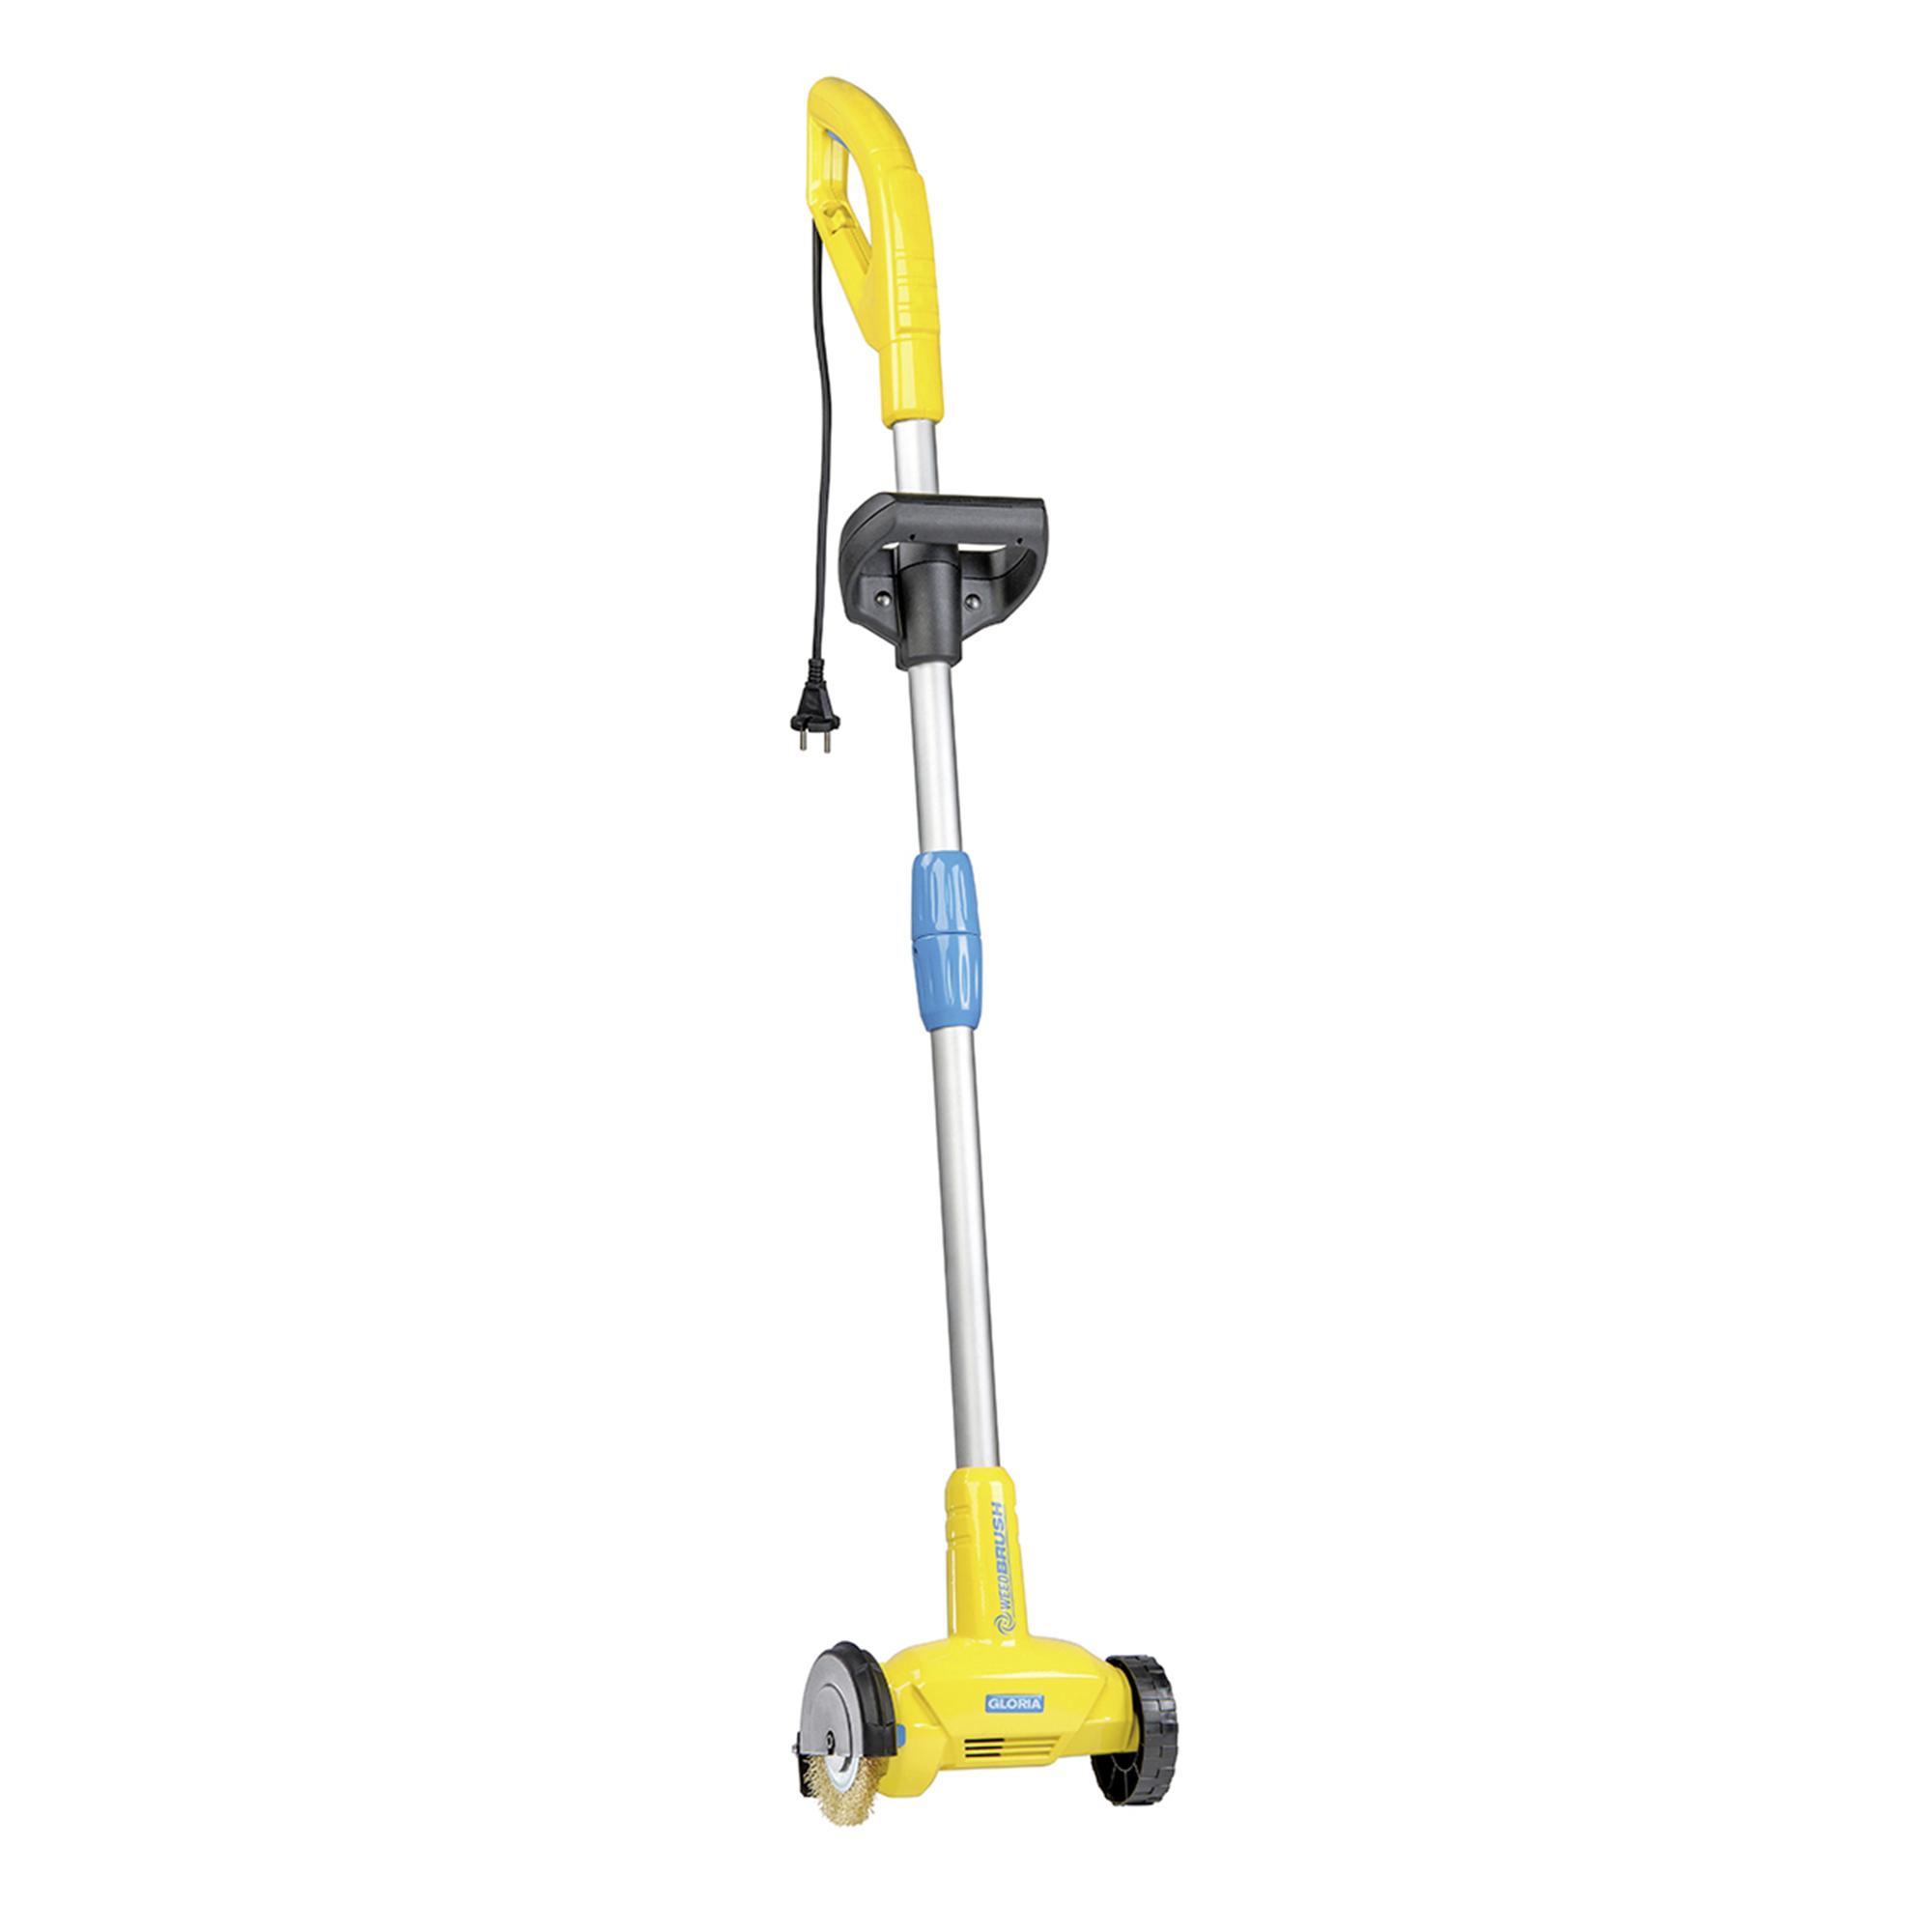 elektrische fugenbürste weedbrush ǀ toom baumarkt